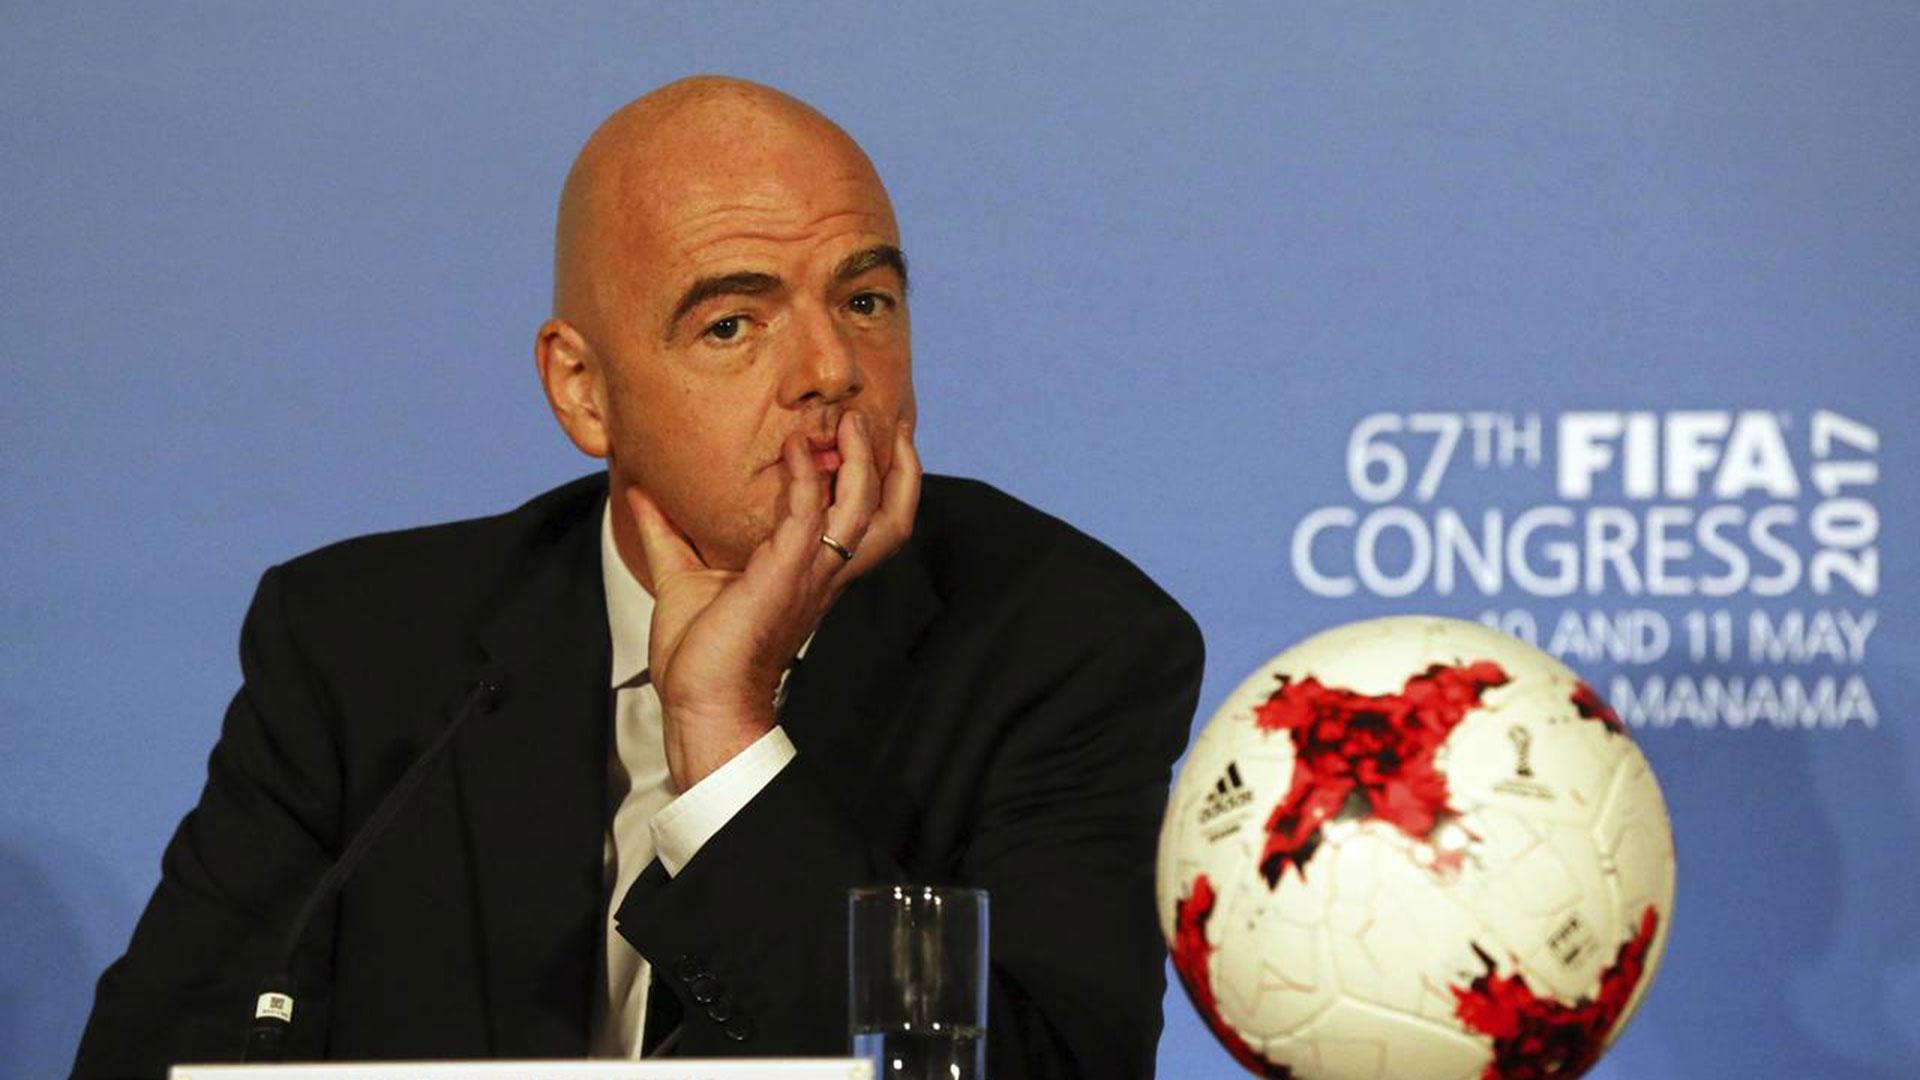 Infantino asumió como presidente de la FIFA bajó un discurso de transparencia